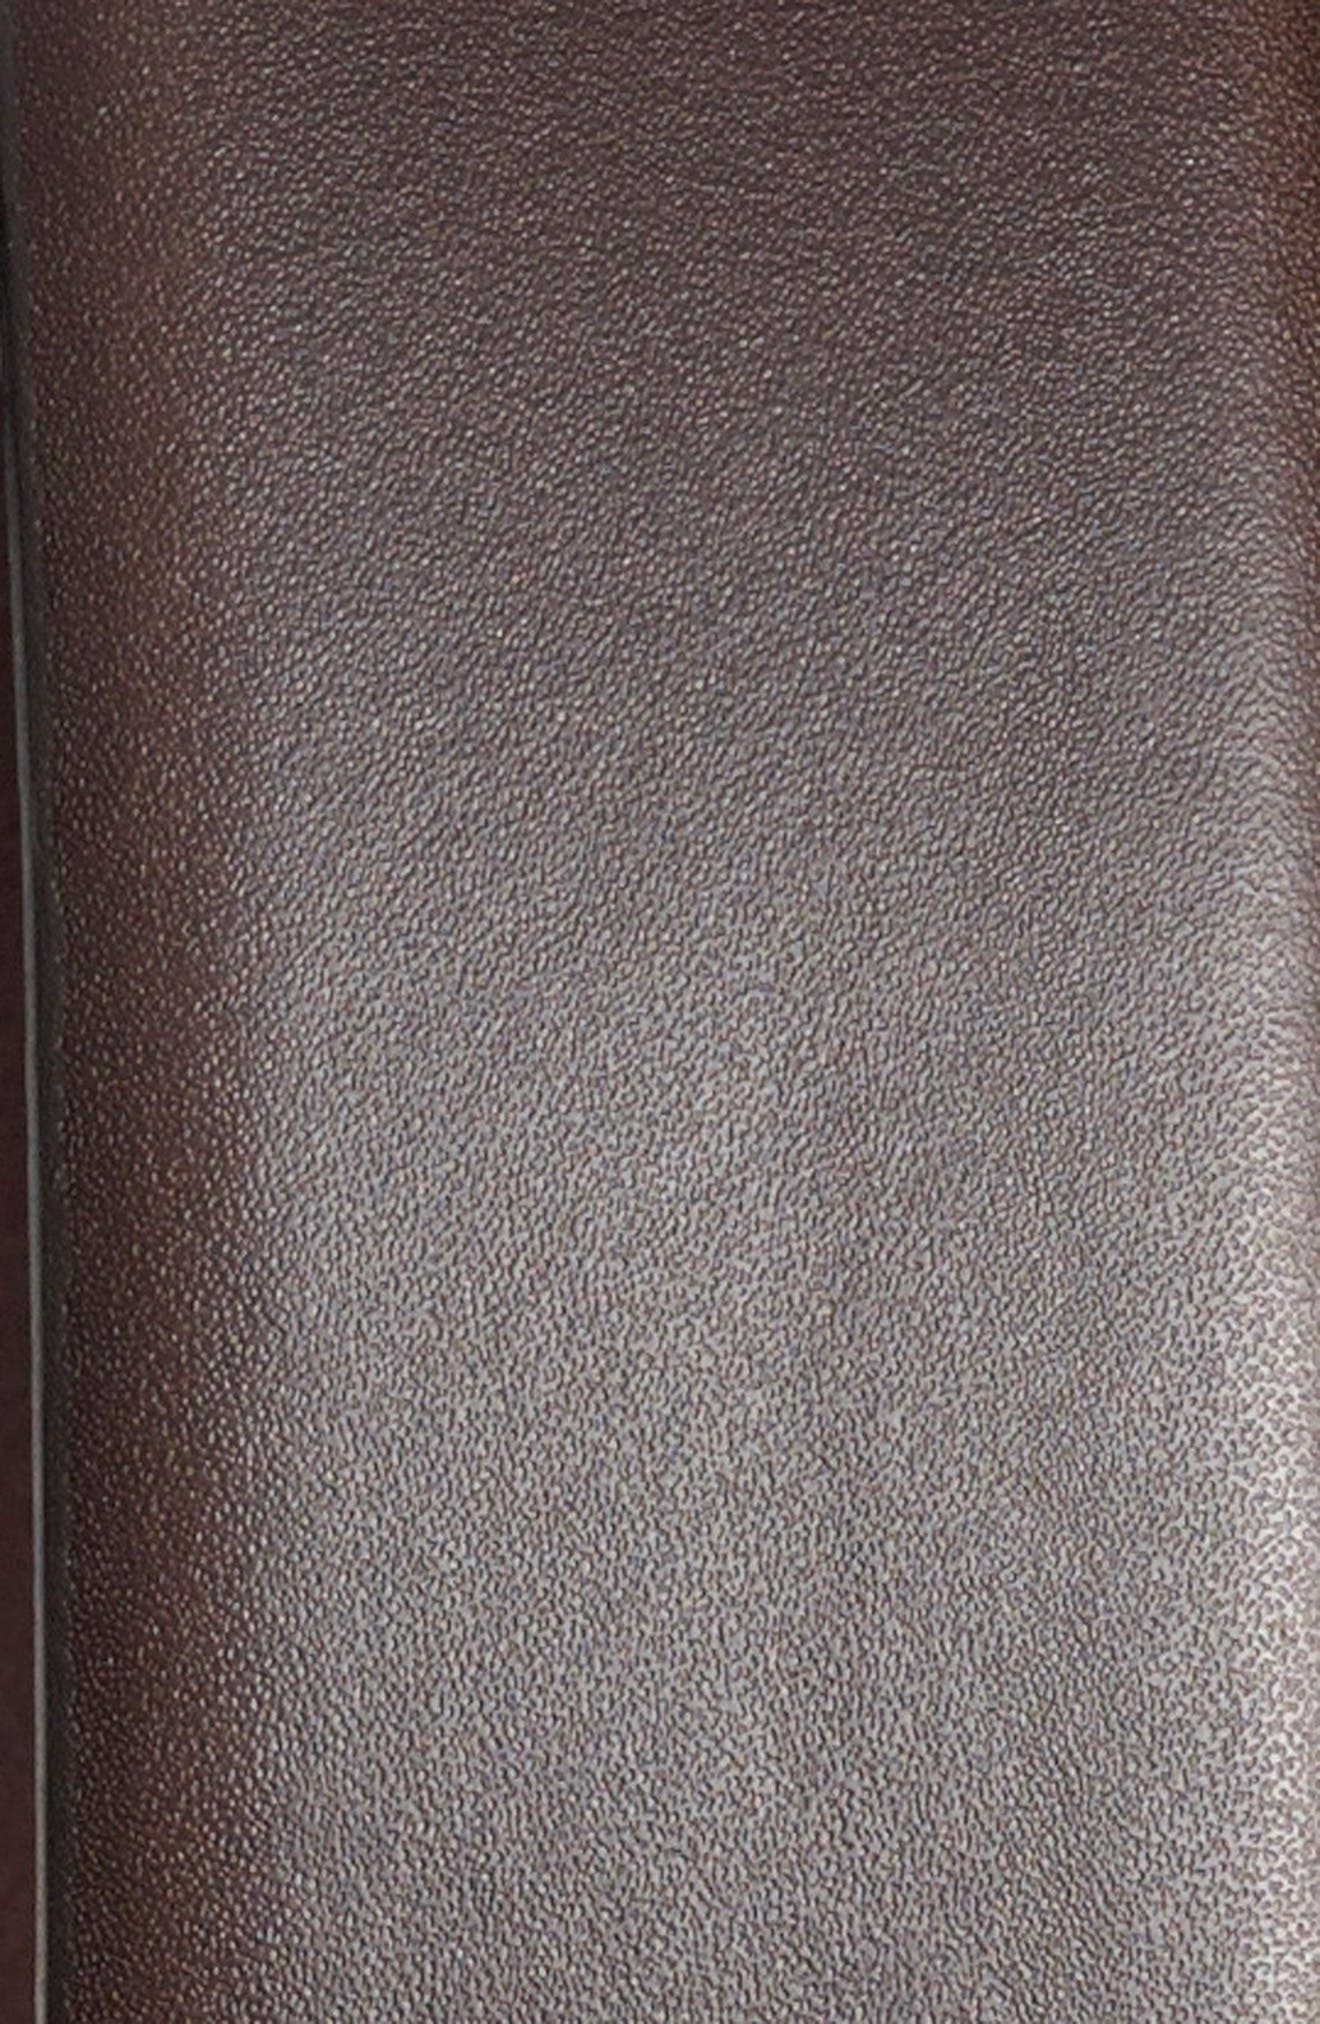 'Brandon' Leather Belt,                             Alternate thumbnail 2, color,                             Dark Brown